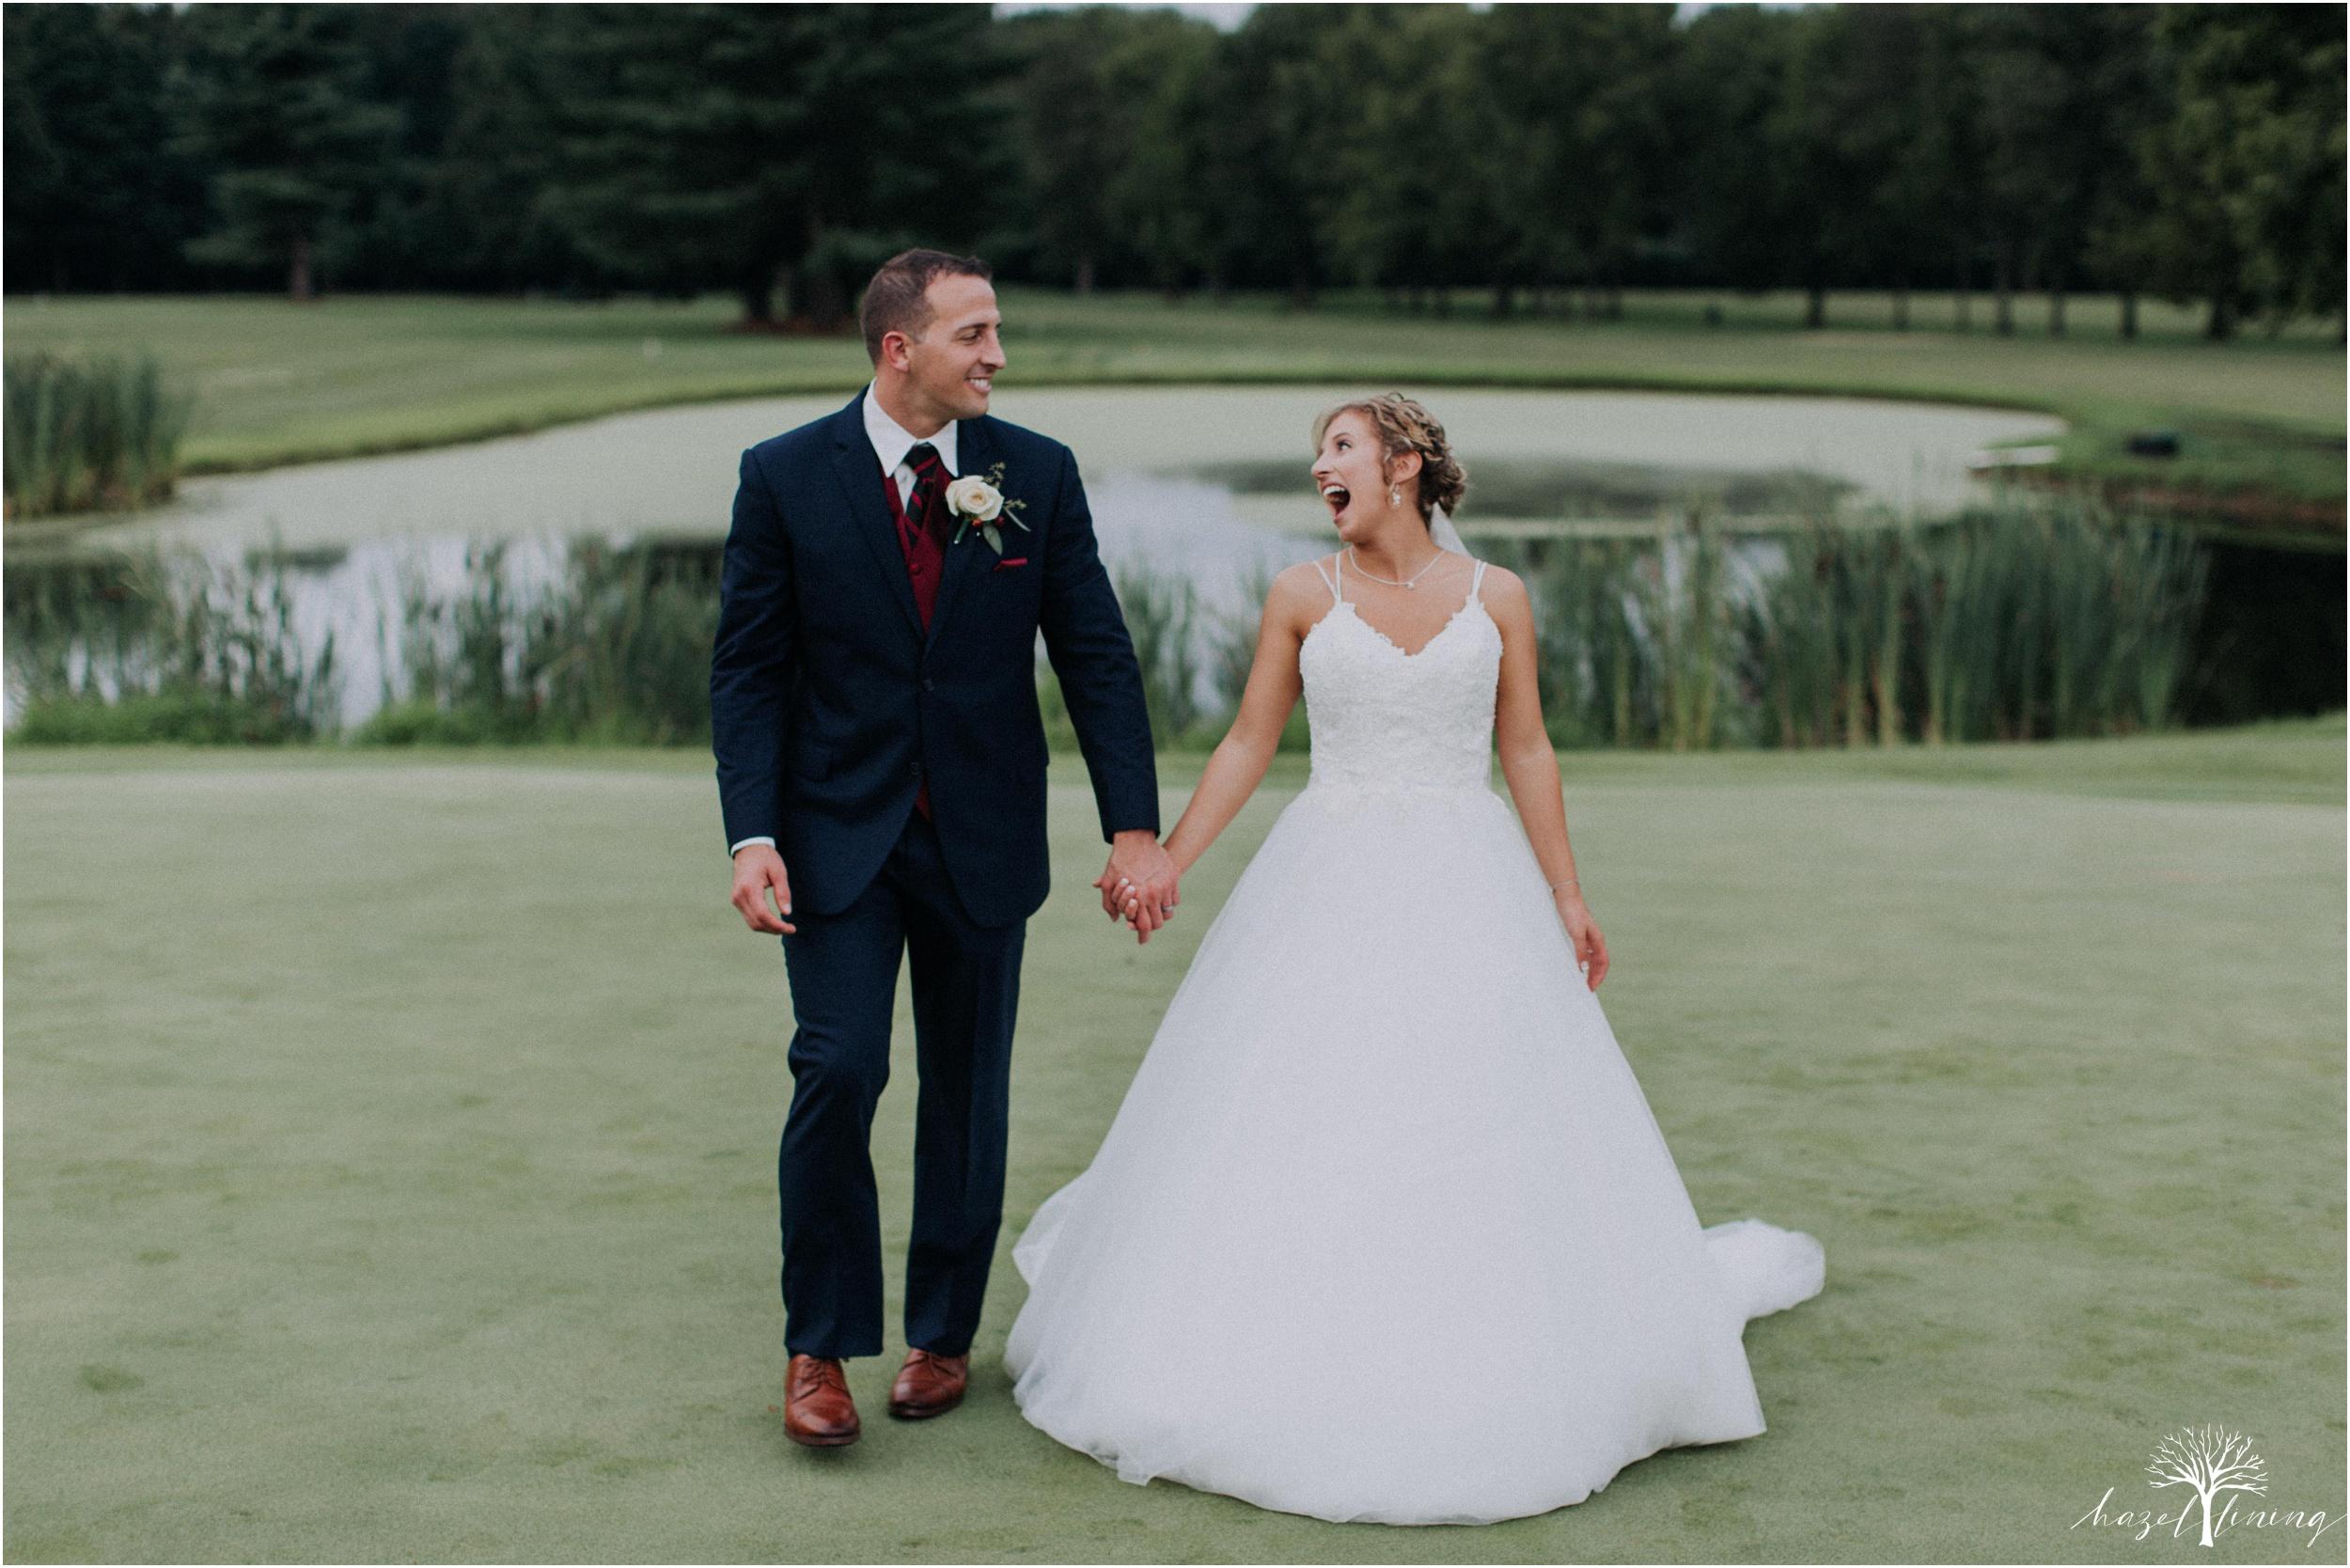 jonathan-weibel-becky-haywood-loft-at-sweetwater-cc-pennsburg-pennsylvania-rainy-day-summer-wedding-hazel-lining-travel-wedding-elopement-photography_0082.jpg